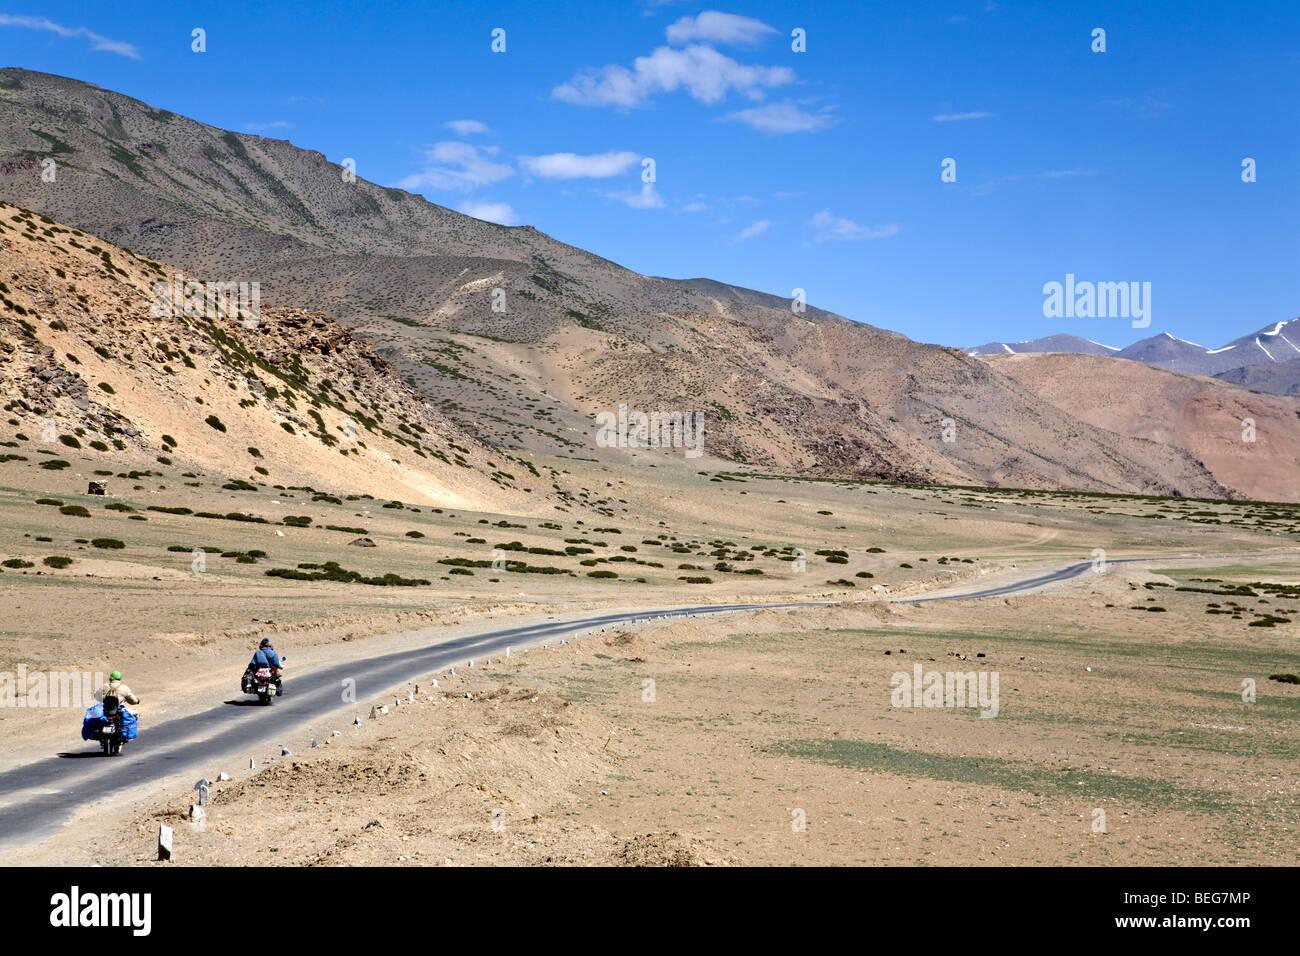 Traveling on Enfield motorbikes. Manali-Leh road. Ladakh. India - Stock Image